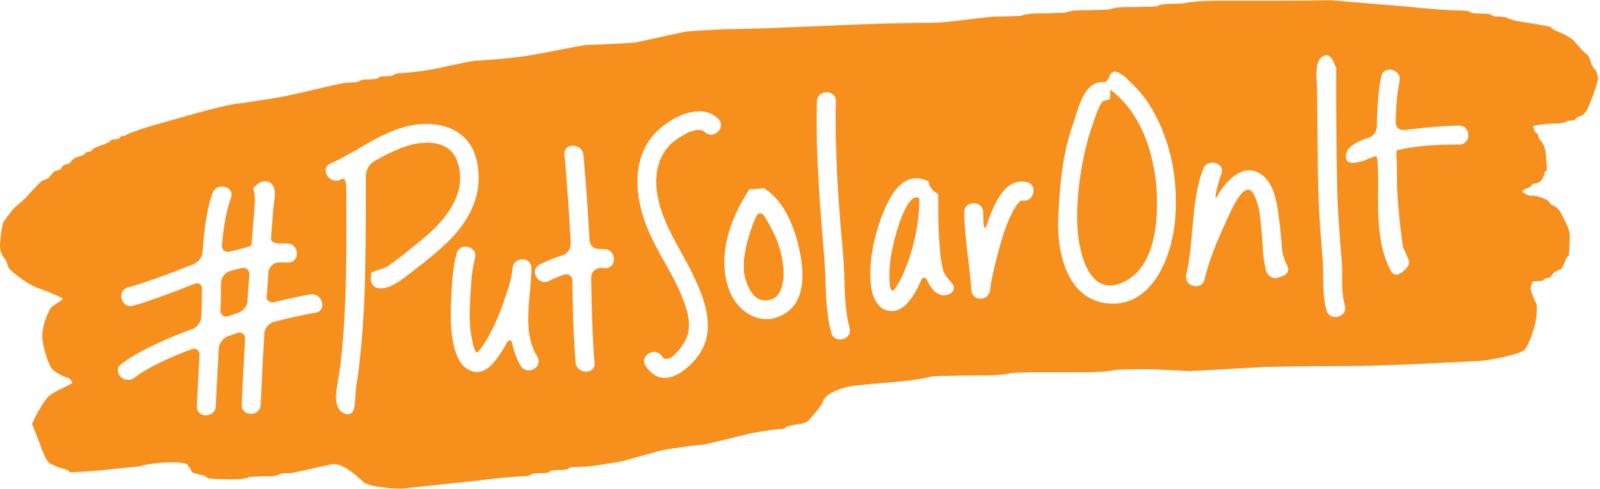 PSOI_DOA_logo-sm.png